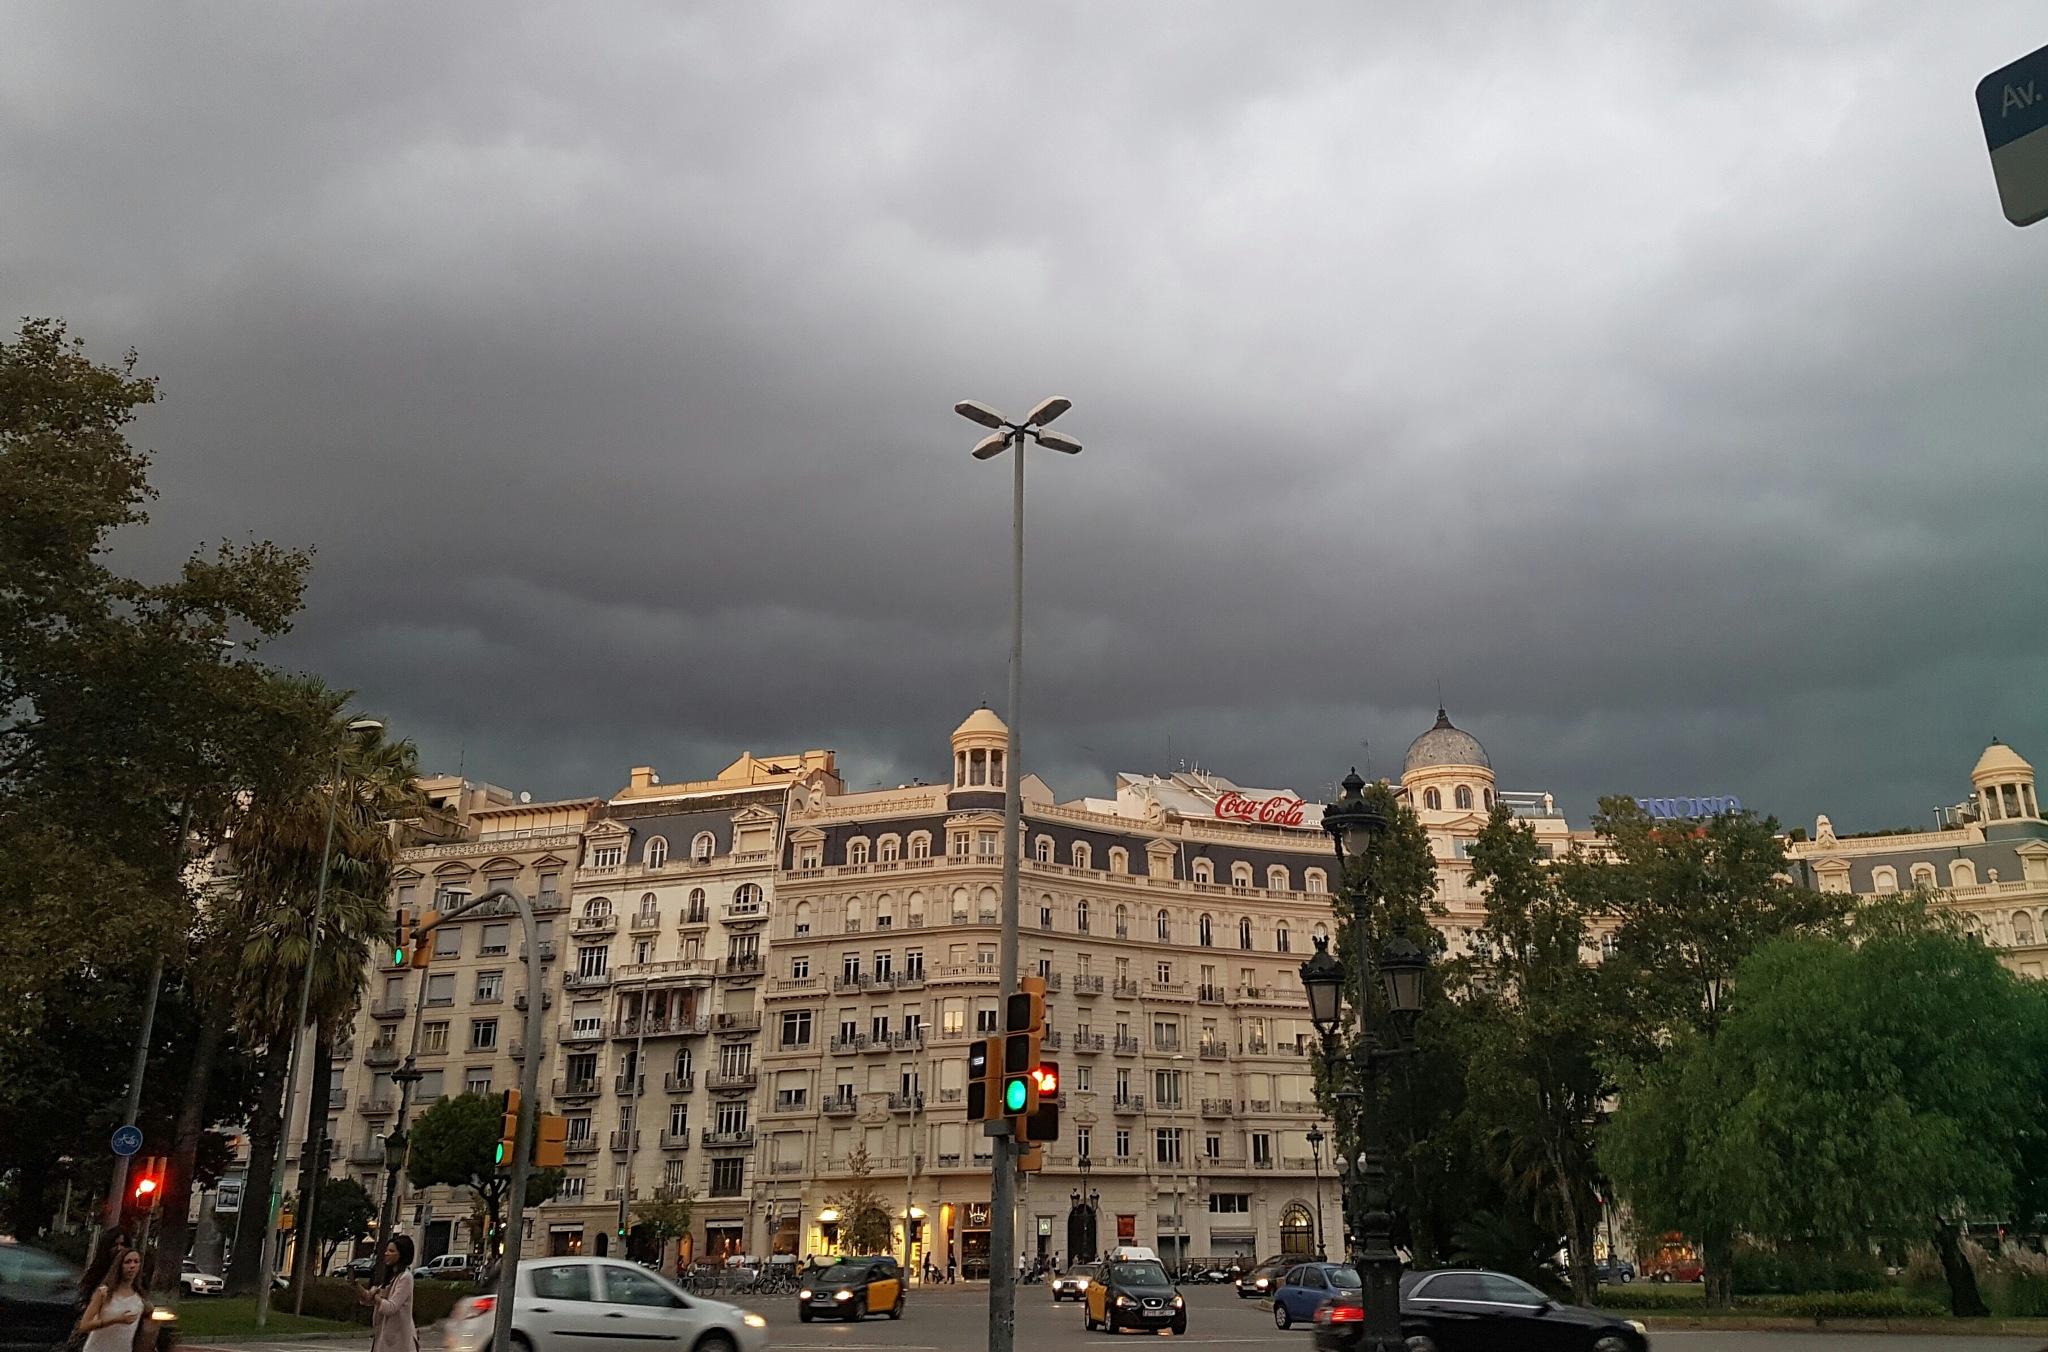 Storm over Barcelona by PortenyoBarcino